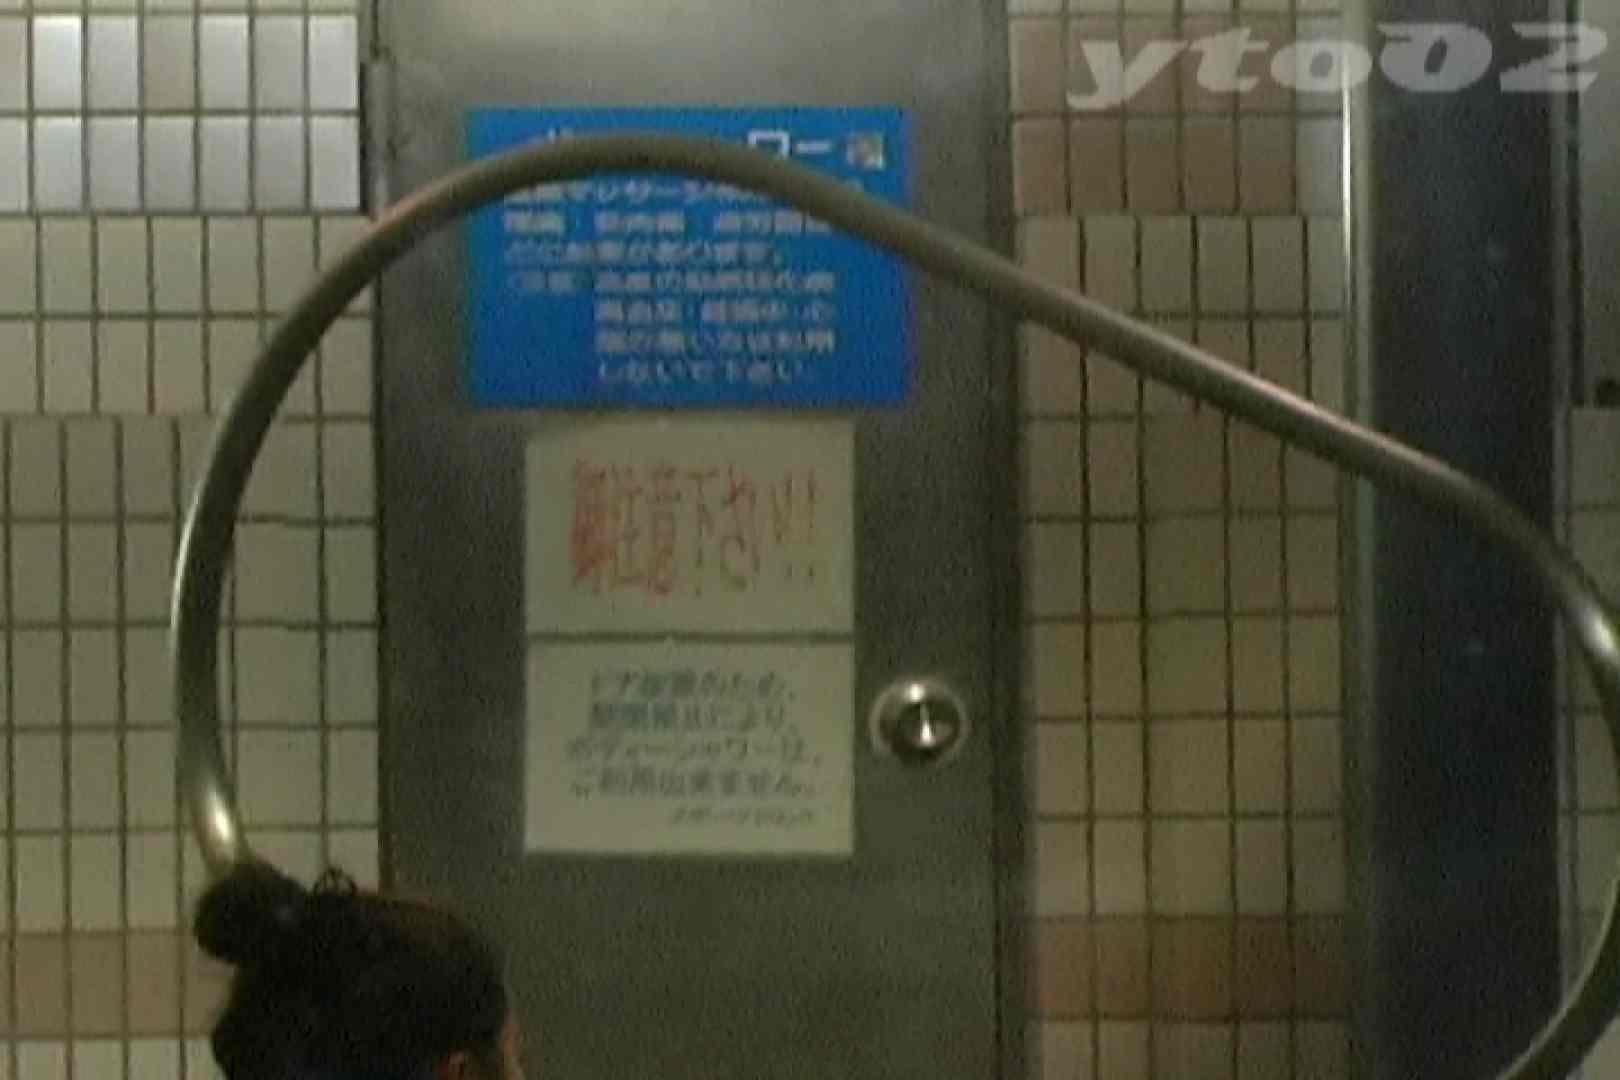 ▲復活限定▲合宿ホテル女風呂盗撮 Vol.11 女風呂  75pic 63